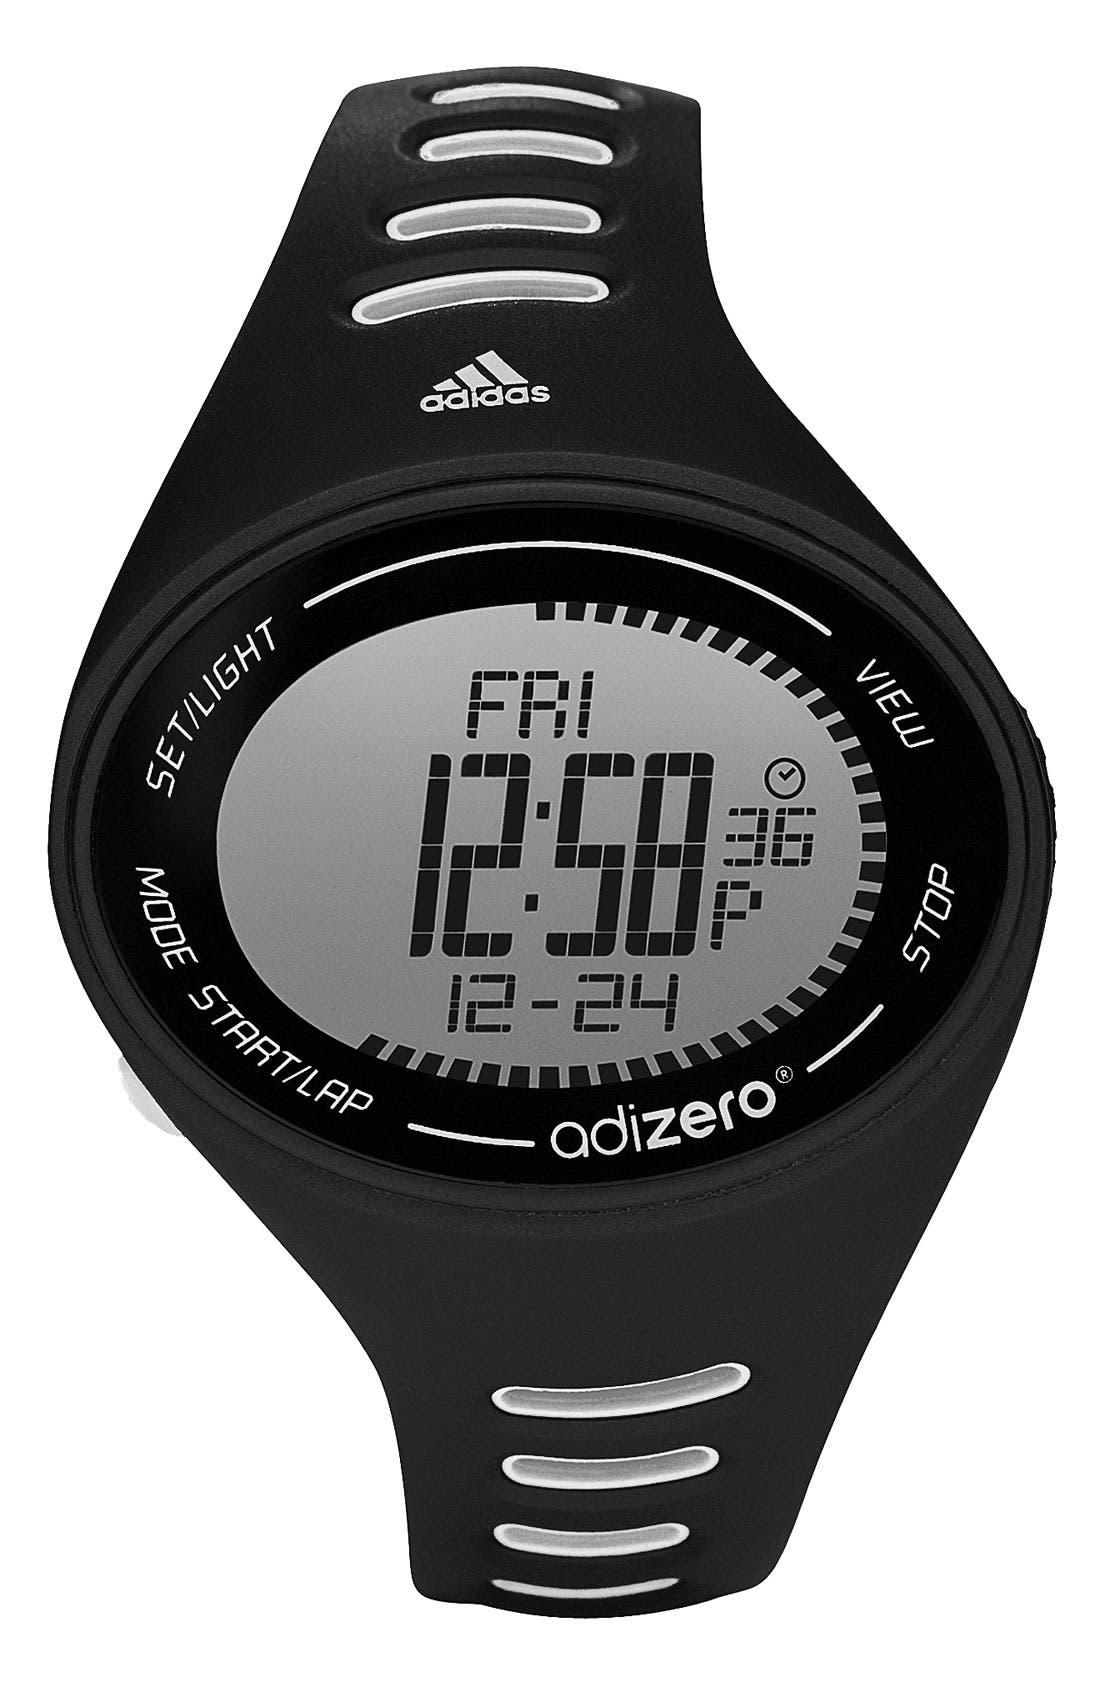 Main Image - adidas Performance 'adiZero' Digital Sport Watch, 49mm x 39mm